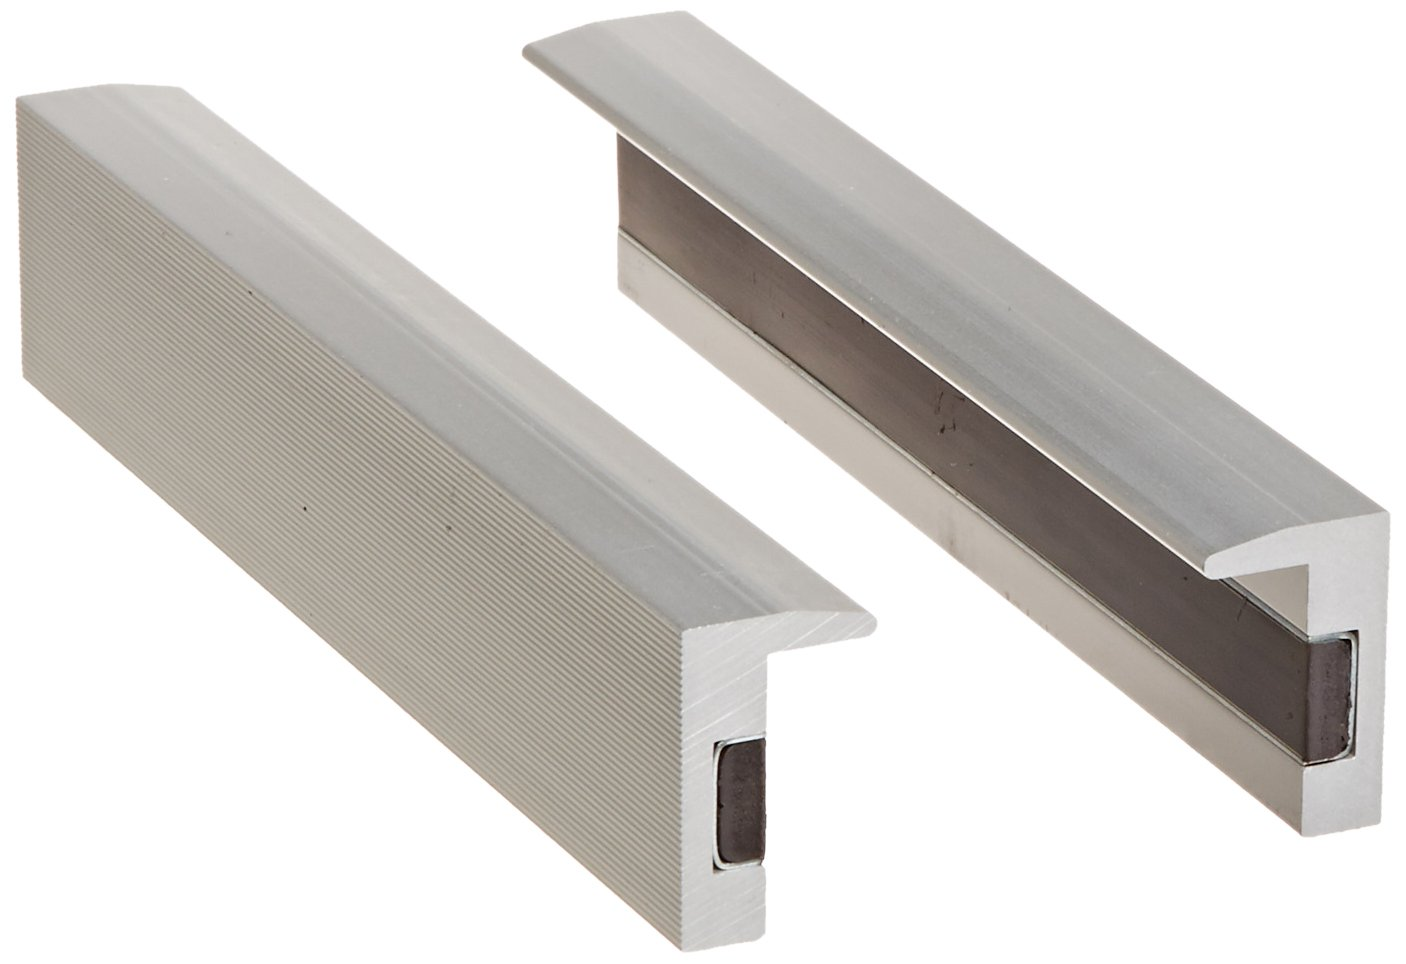 Yost Vises MA-360 6'' Magnetic Aluminum Vise Jaw Caps (1 Pair)